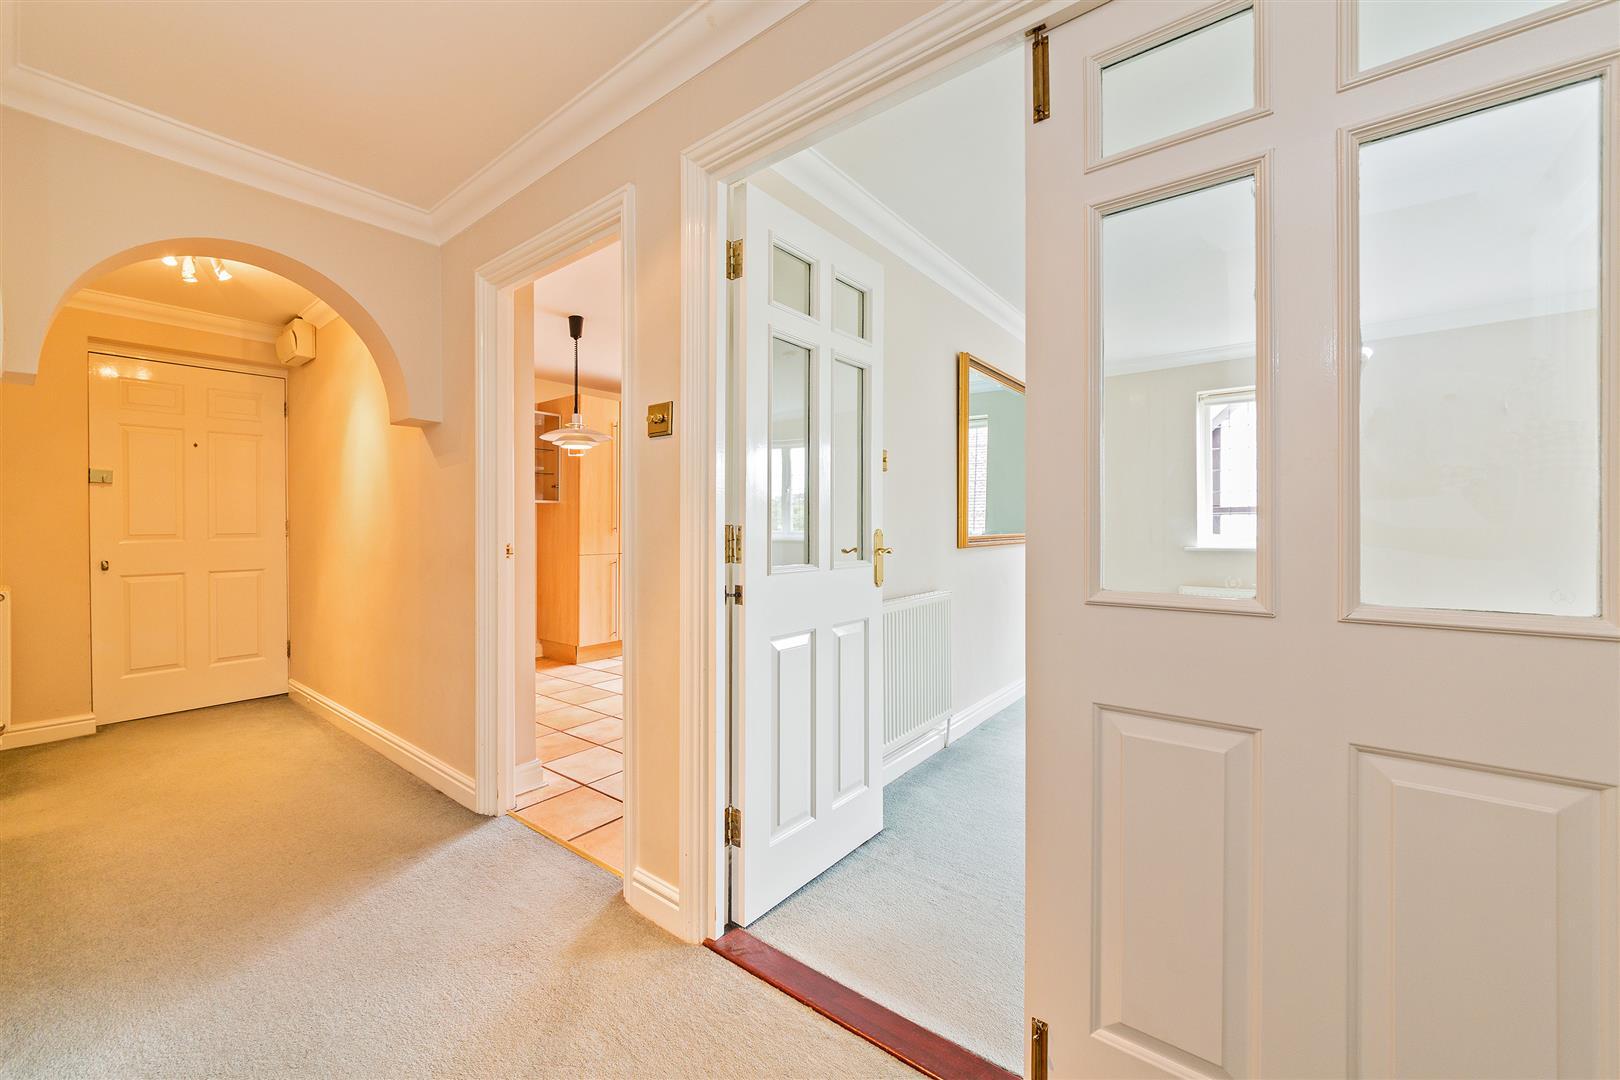 8 Marlborough House  (23) - entrance hall 1.jpg